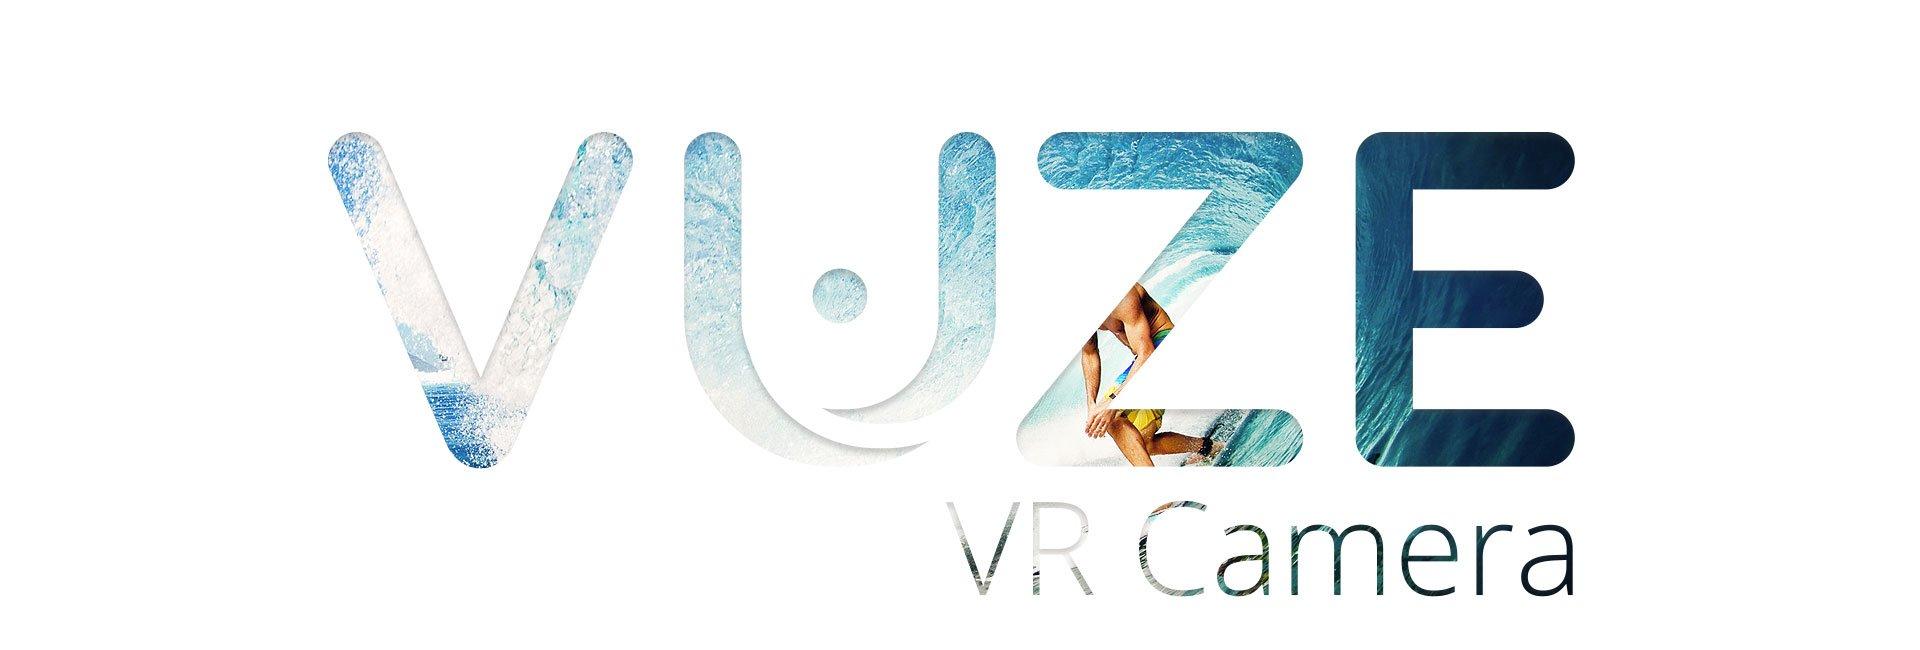 Vuze Camera